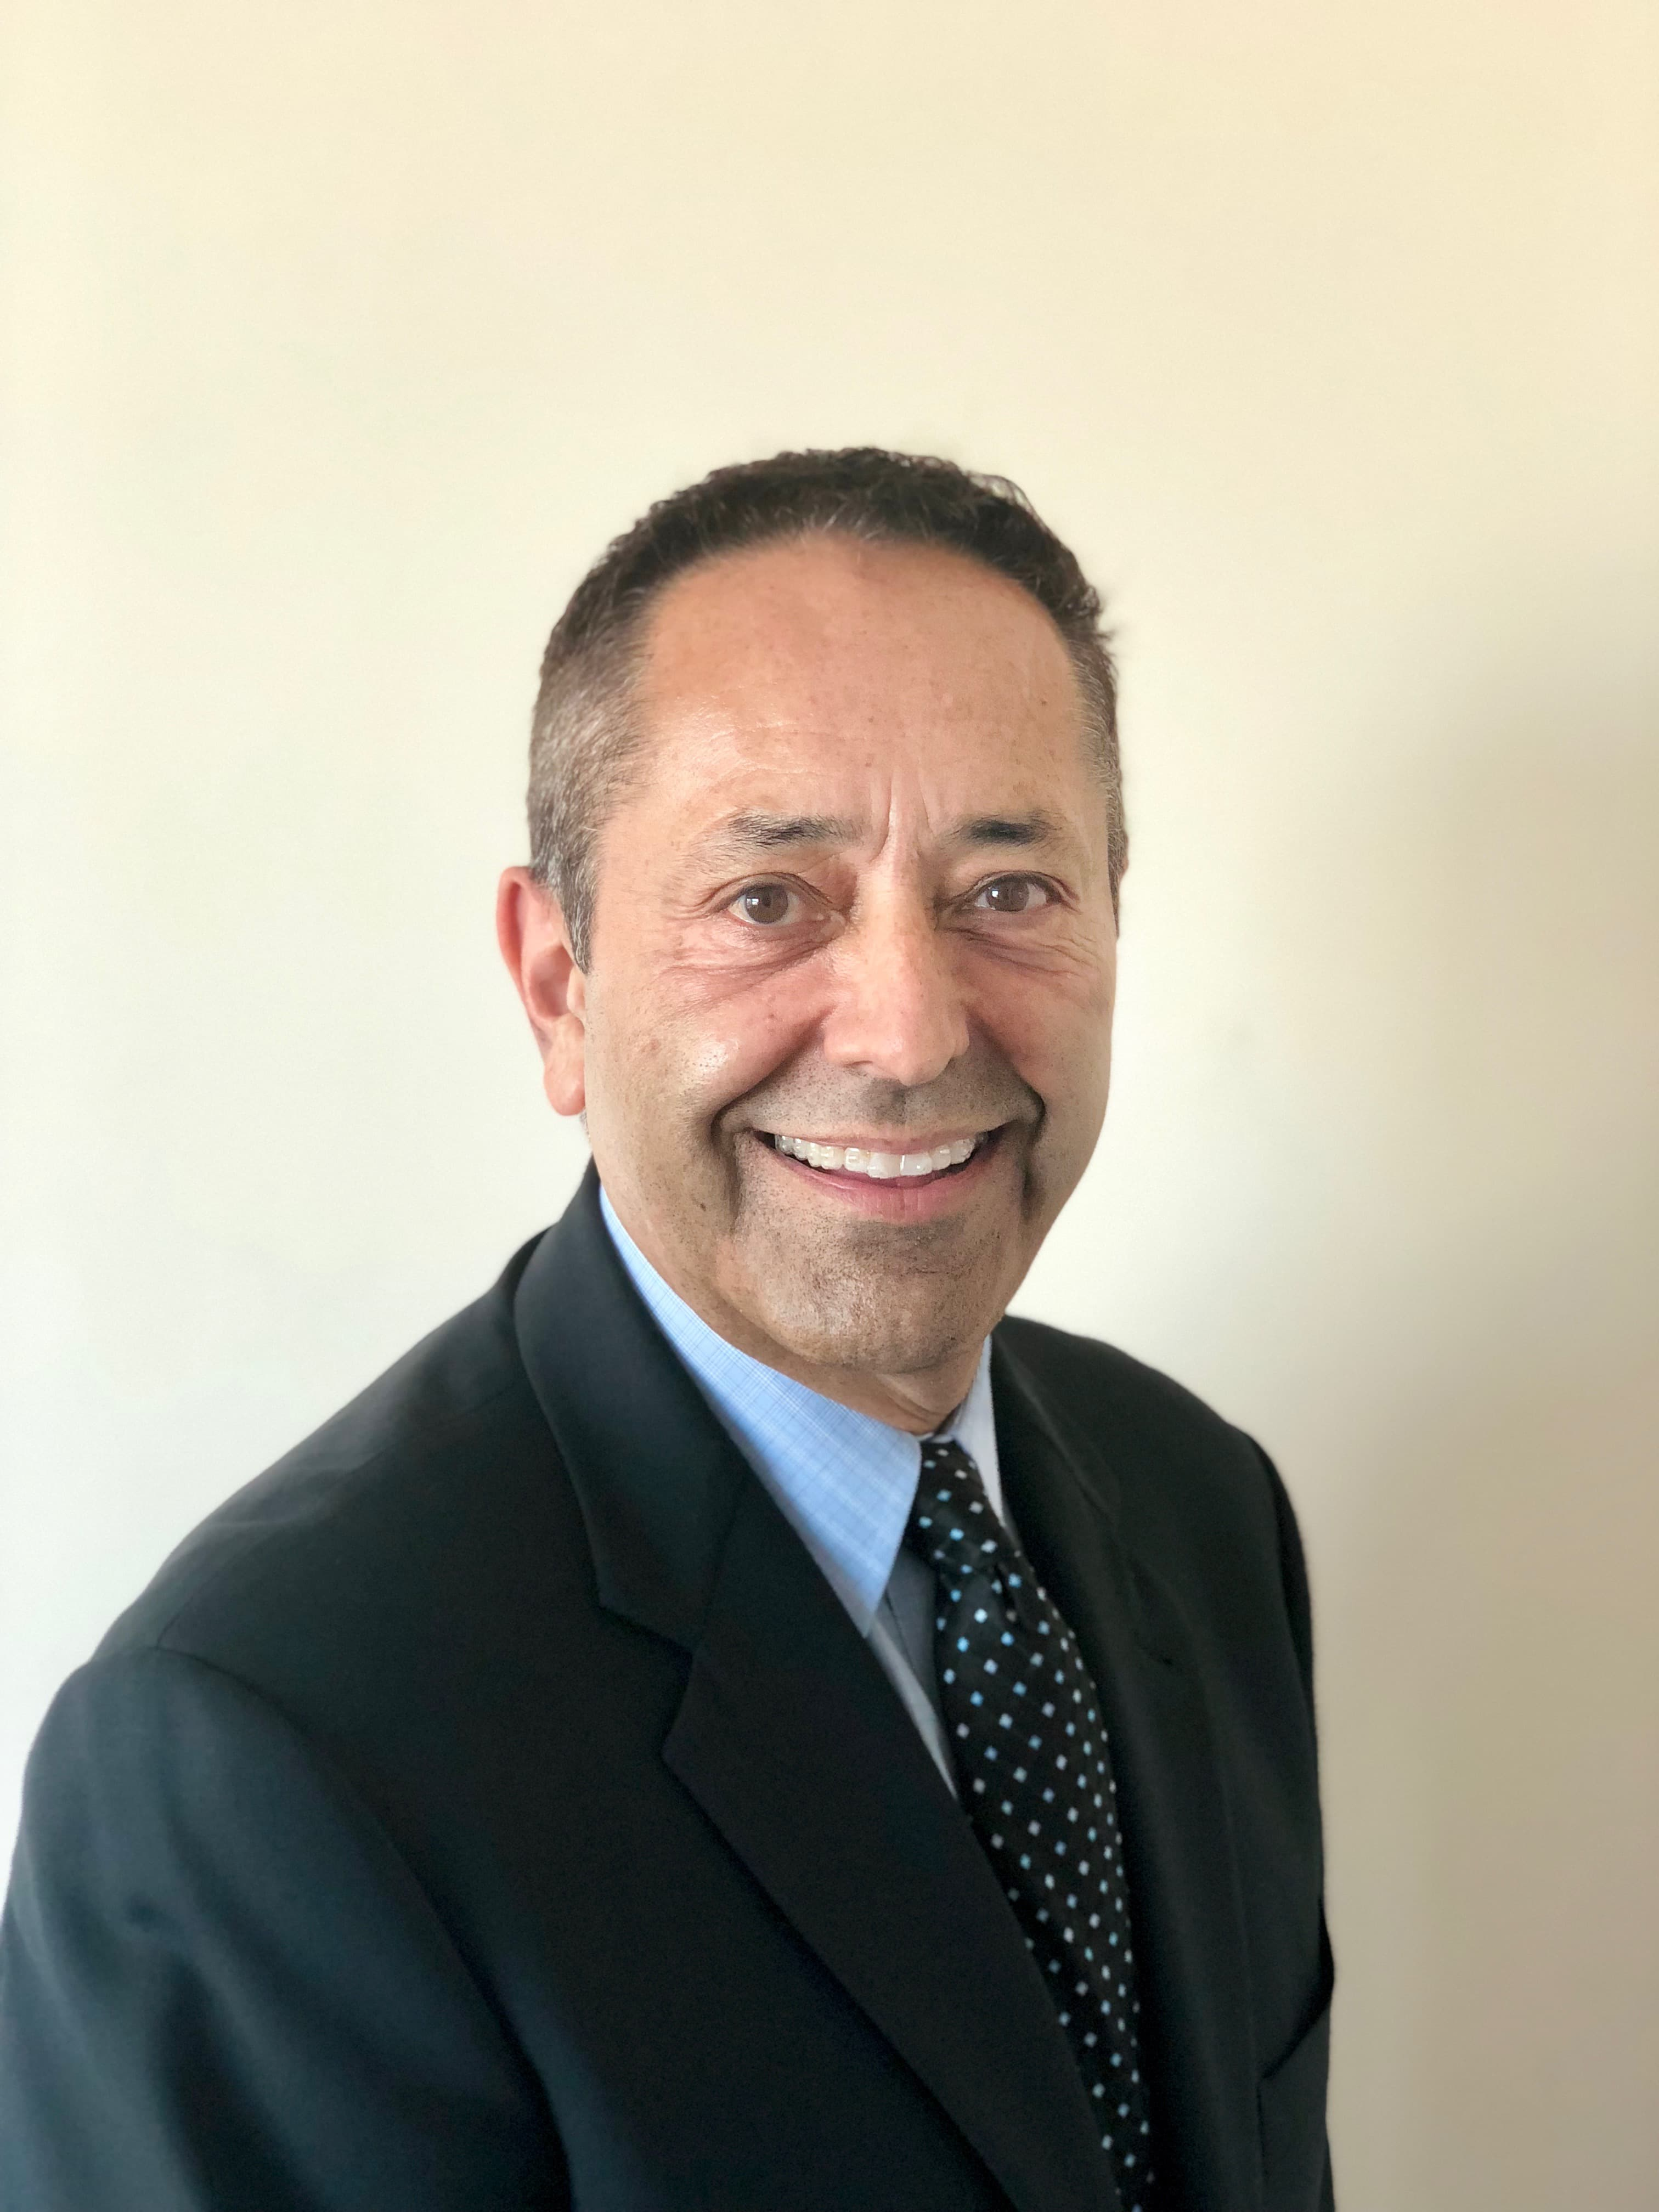 Dr. John Baker, Superintendent, Redwood City Elementary School District (Community, CZI).